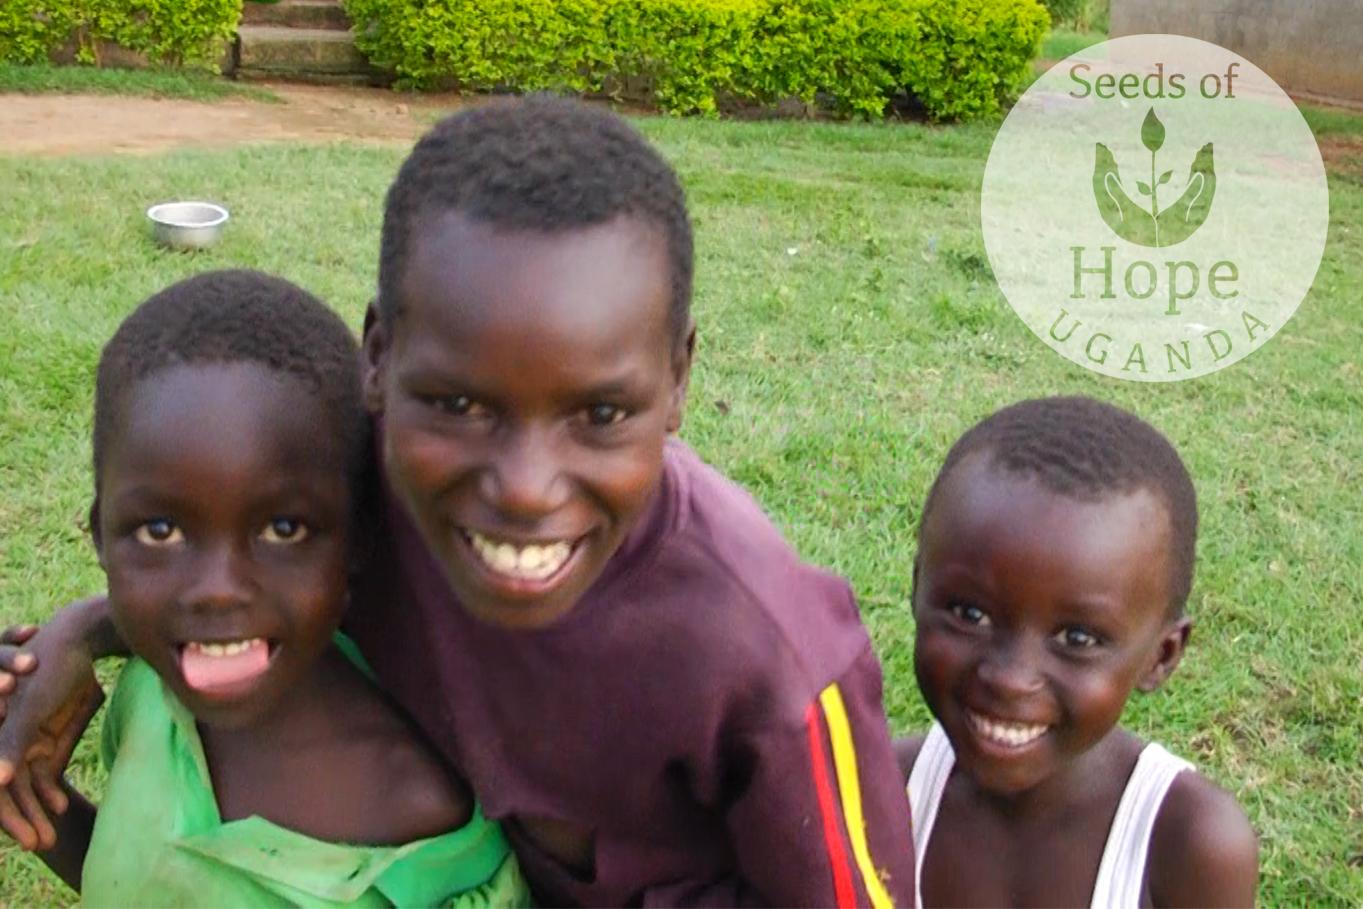 Seeds of Hope Uganda Children orphanage